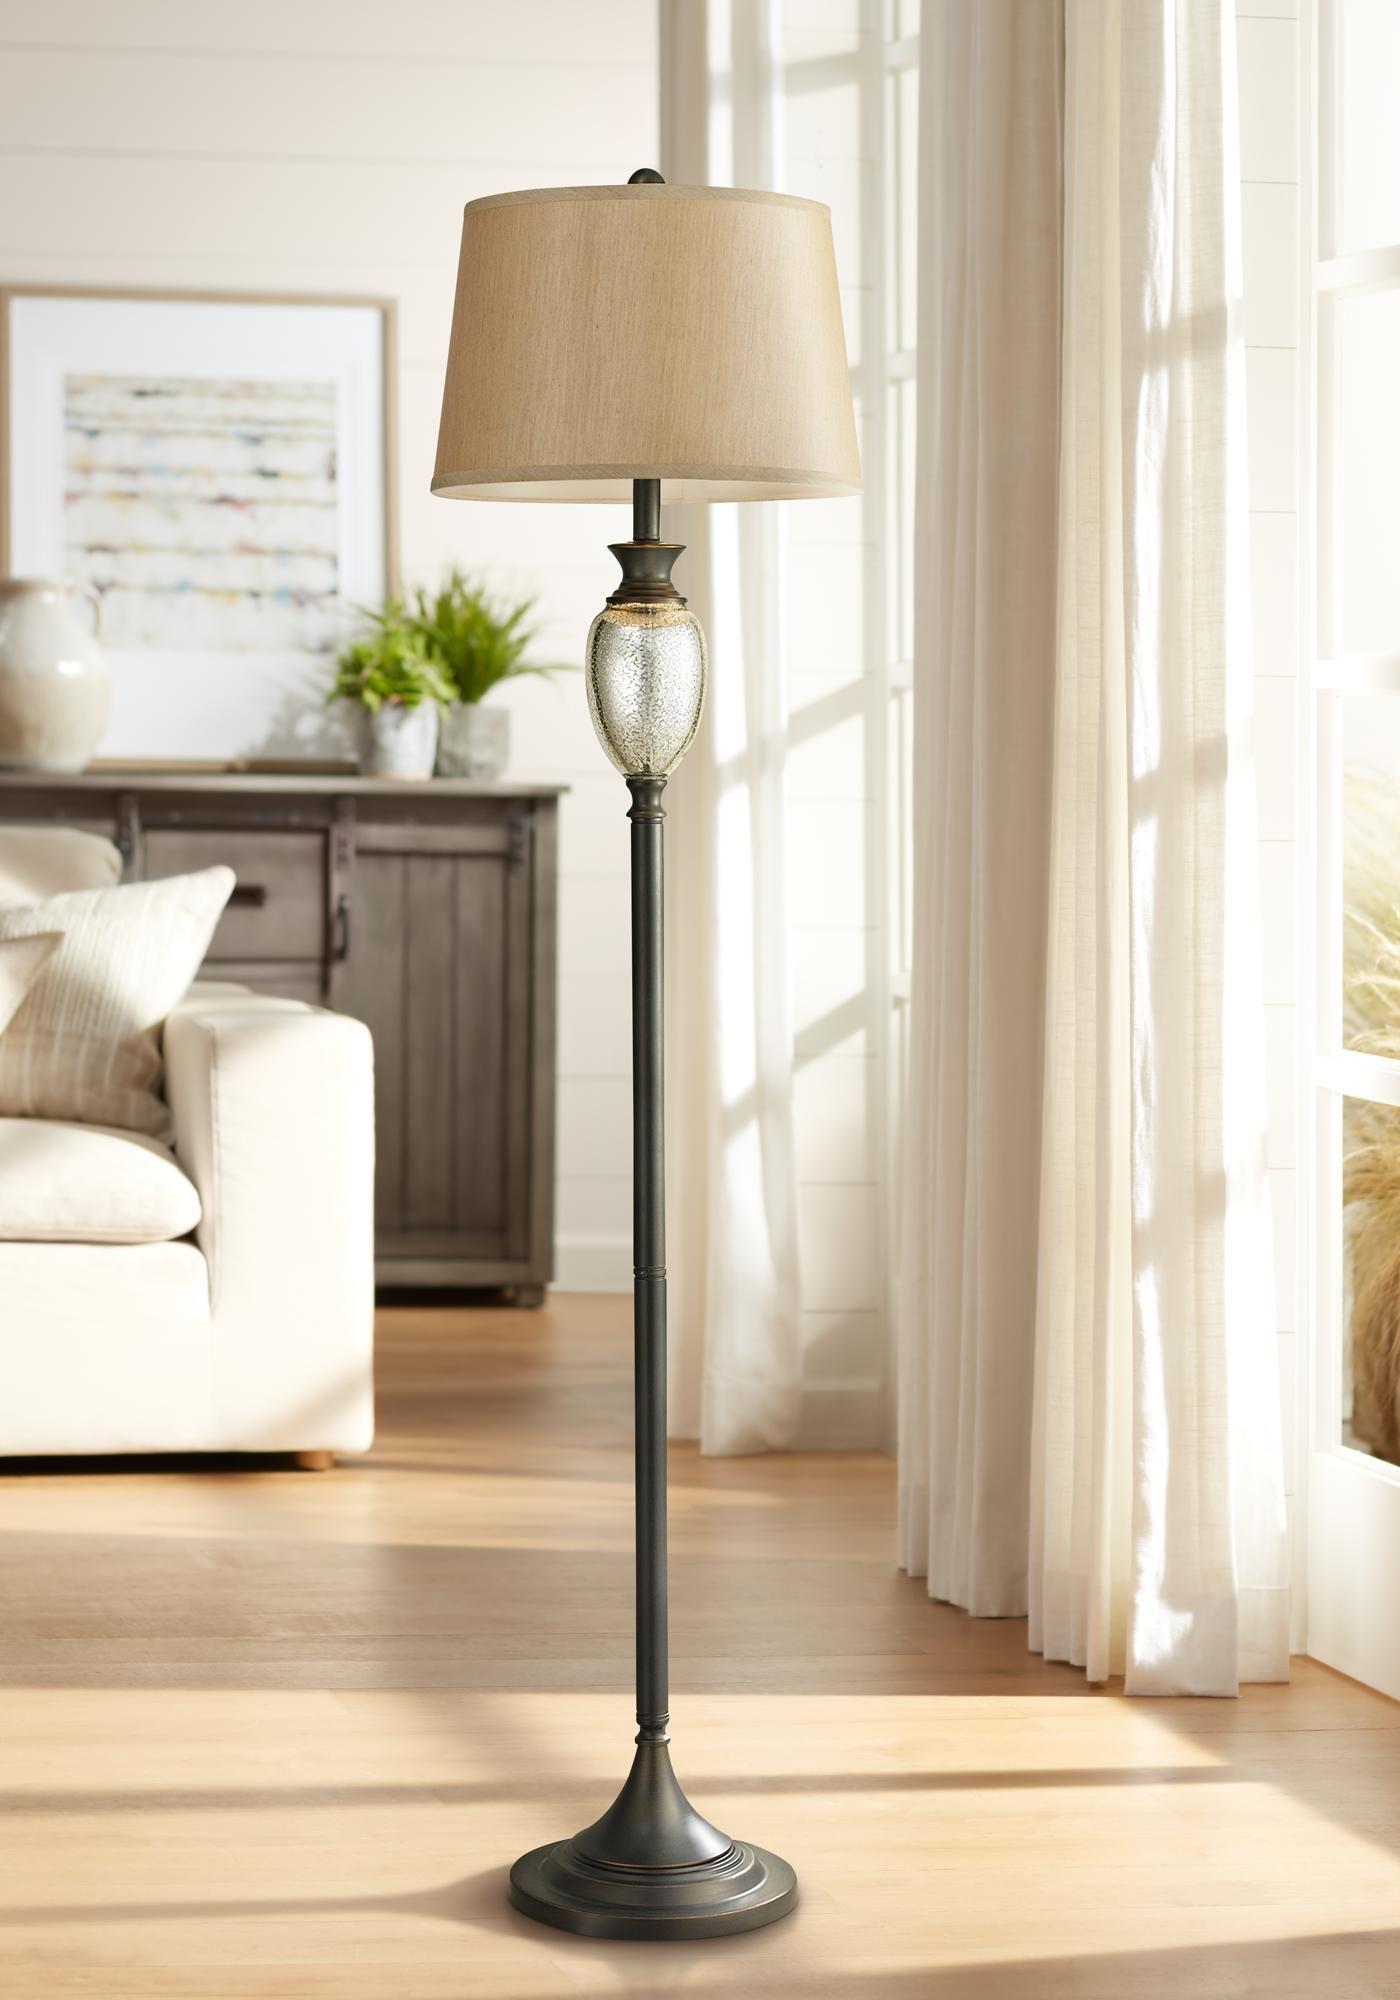 Floor Lamps Caledon 63 High Mercury Glass And Bronze Floor Lamp In 2020 Floor Lamp Styles Bronze Floor Lamp Floor Lamp